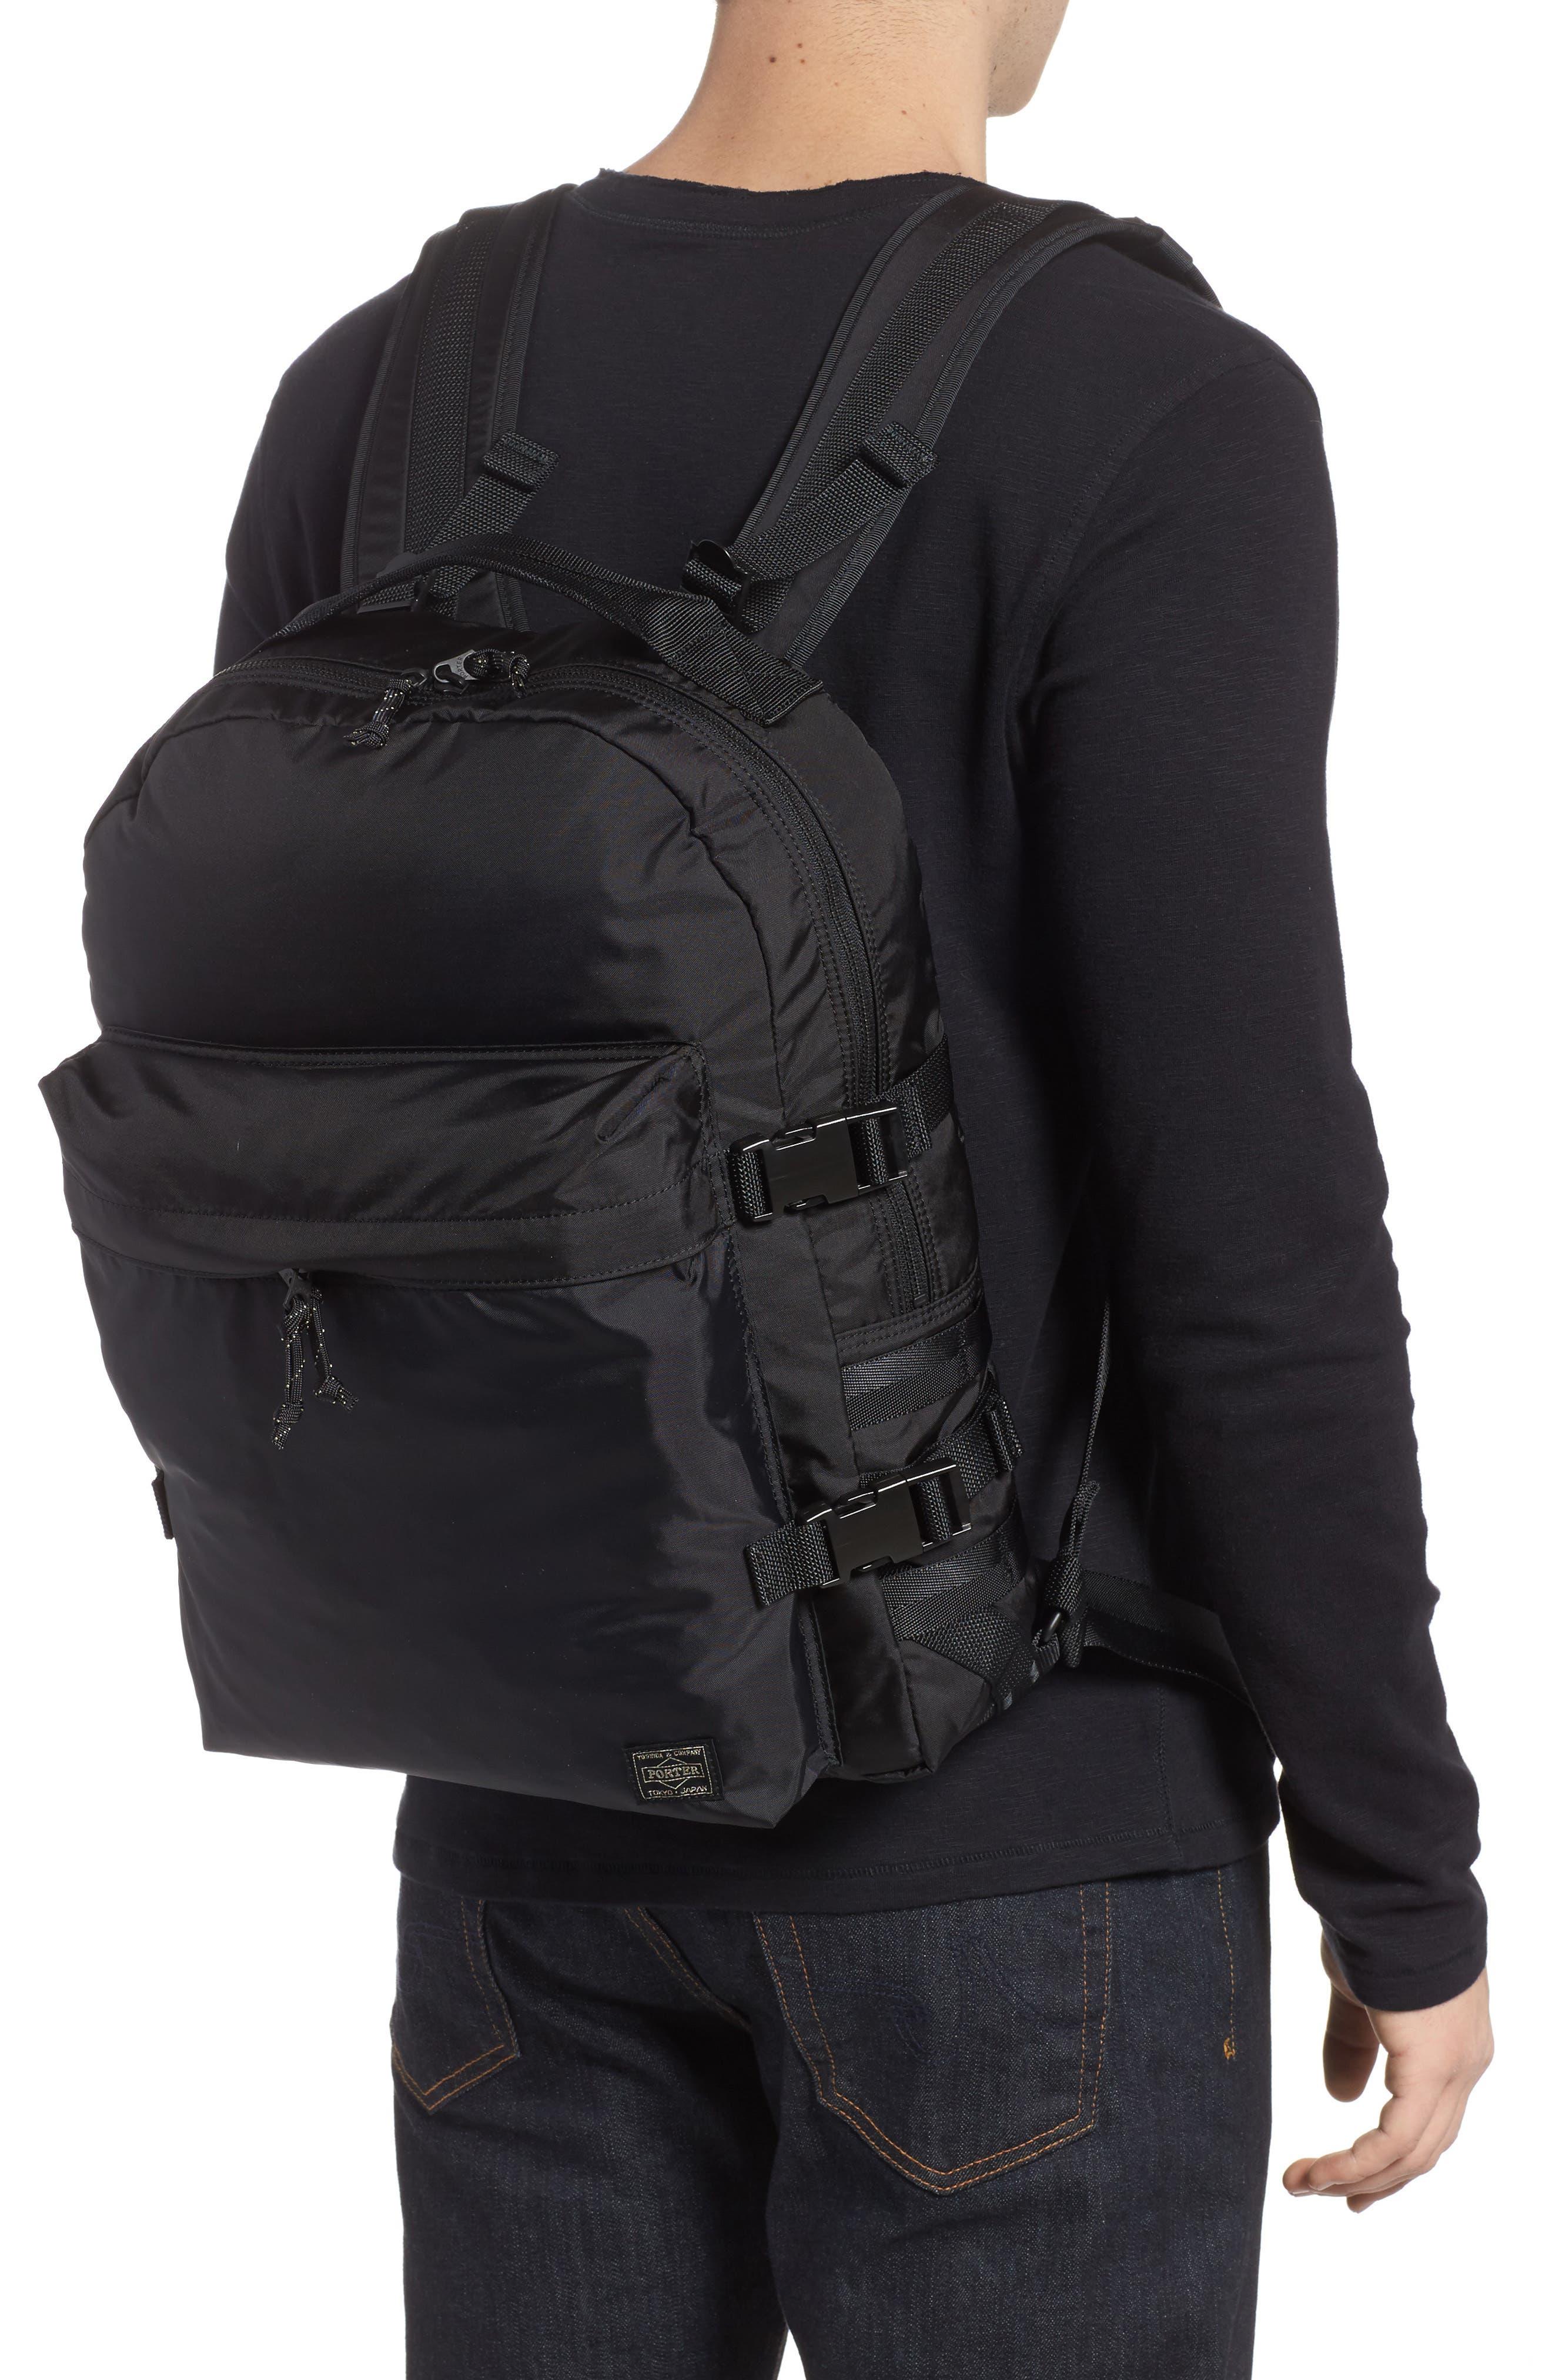 Porter-Yoshida & Co. Force Backpack,                             Alternate thumbnail 2, color,